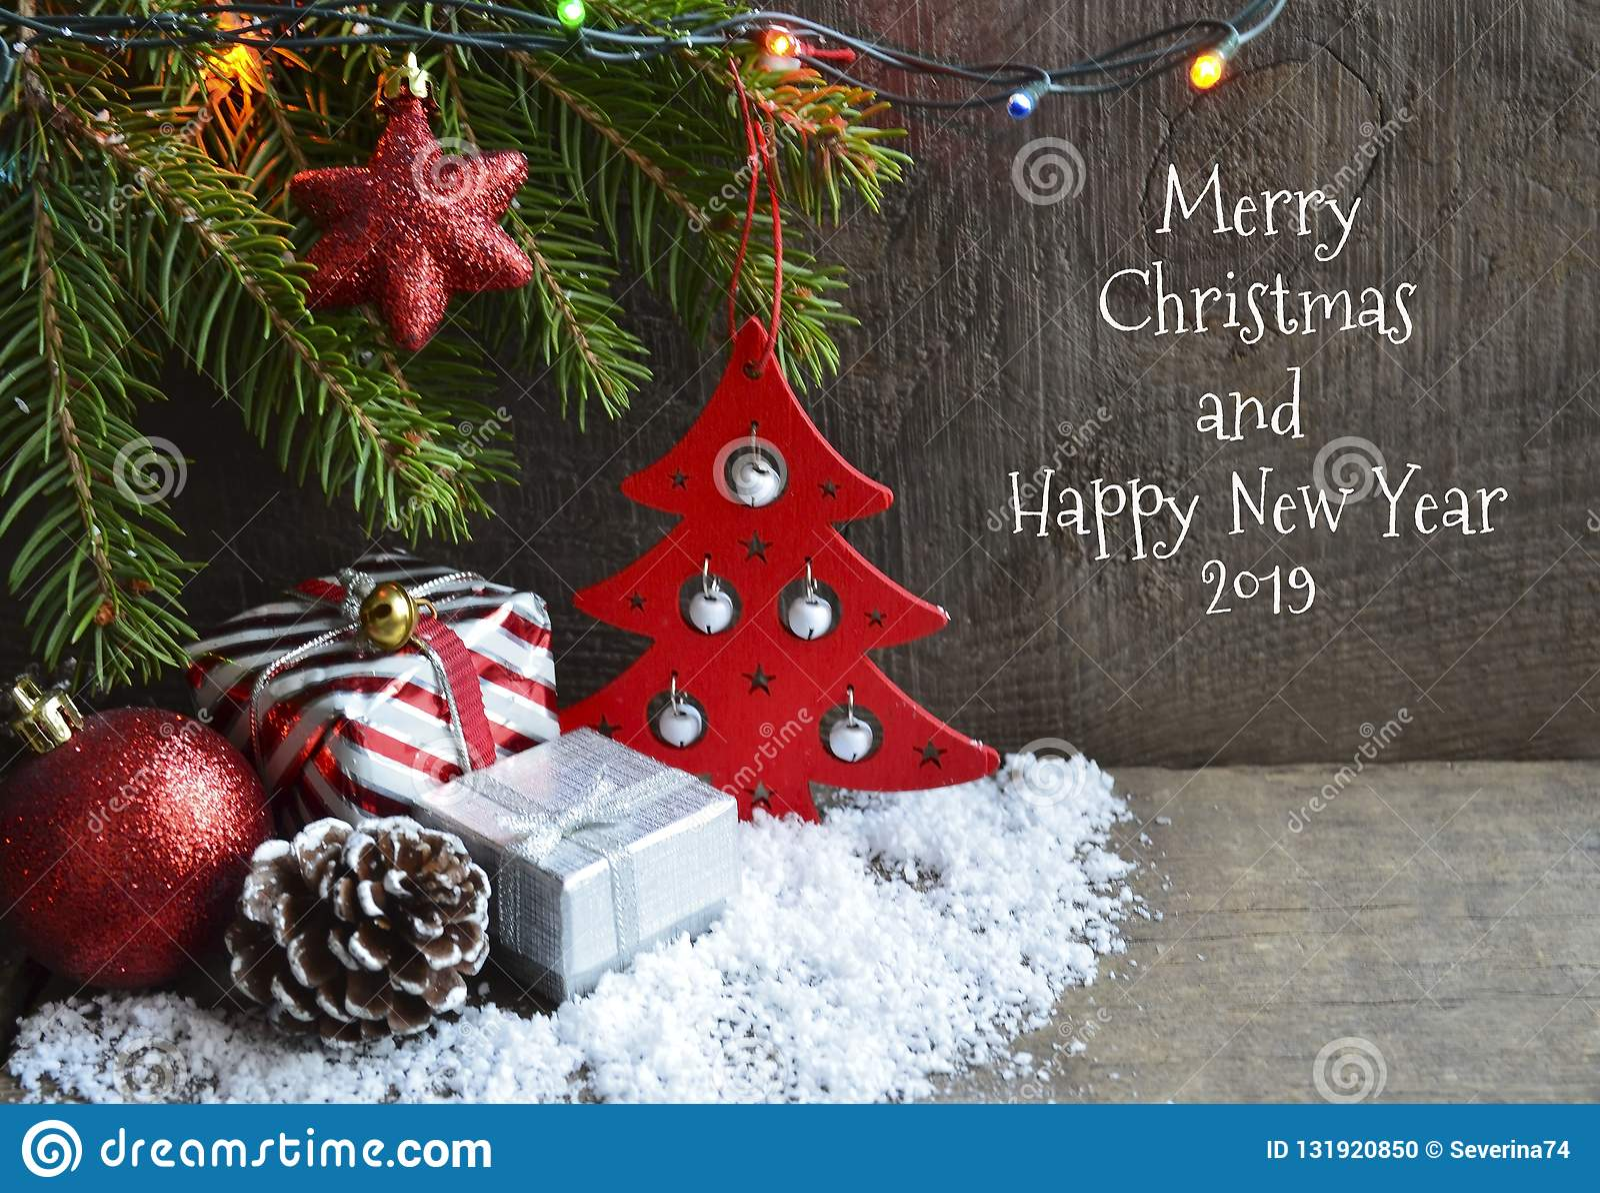 Imagenes Felicitacion Navidad 2019.Tarjeta 2019 De Felicitacion De La Feliz Navidad Y De La